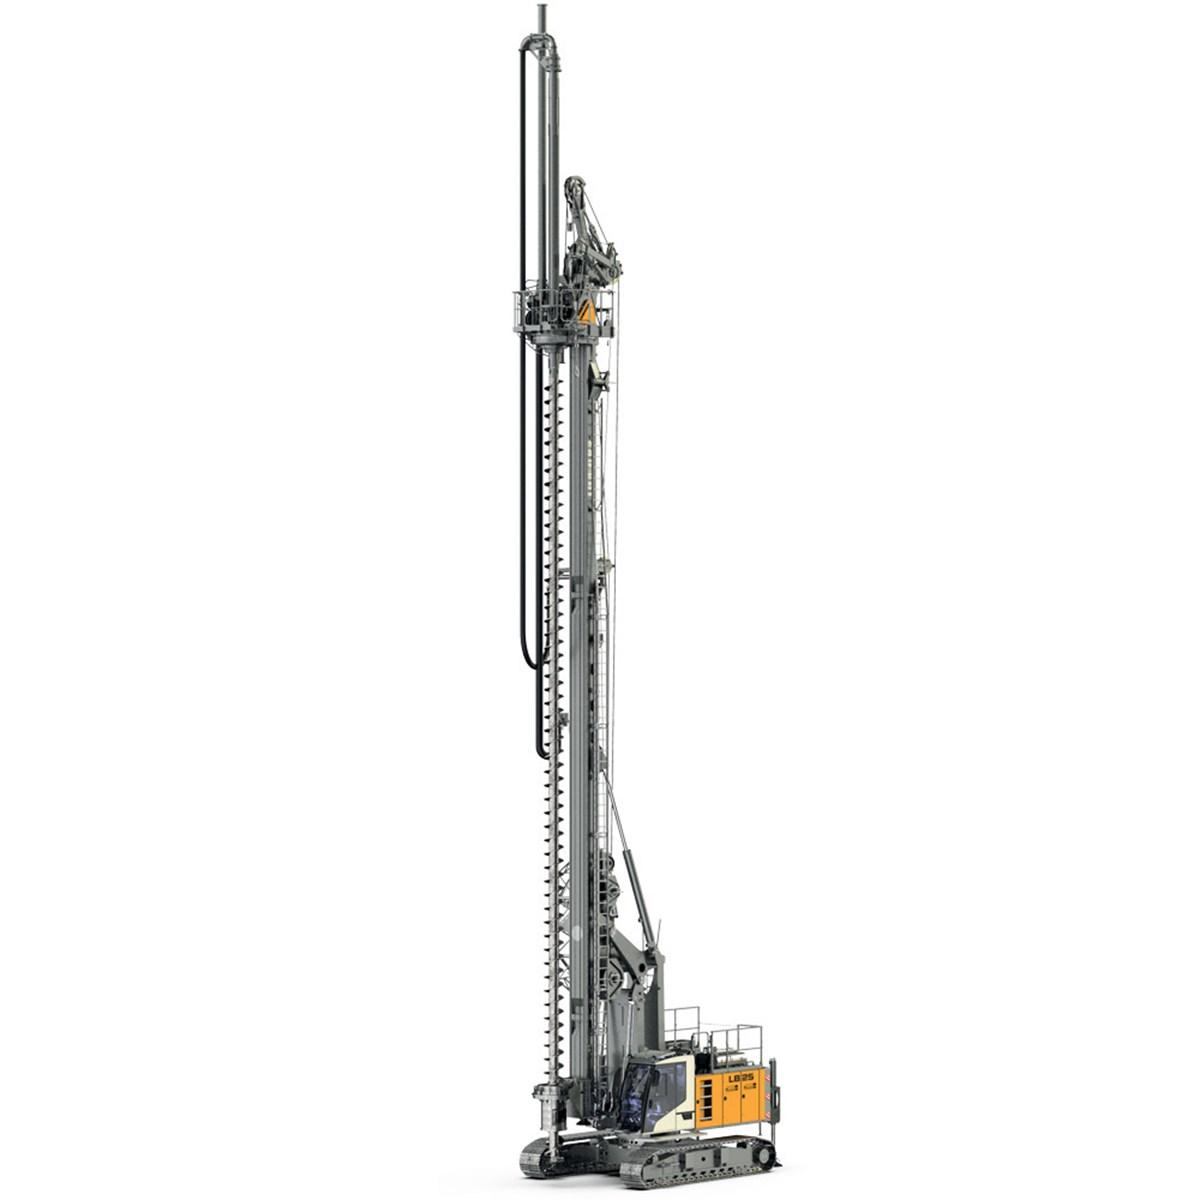 liebherr-lb-25-drehbohrgeraet-drilling-cfa-drilling-continuous-flight-auger-1.jpg